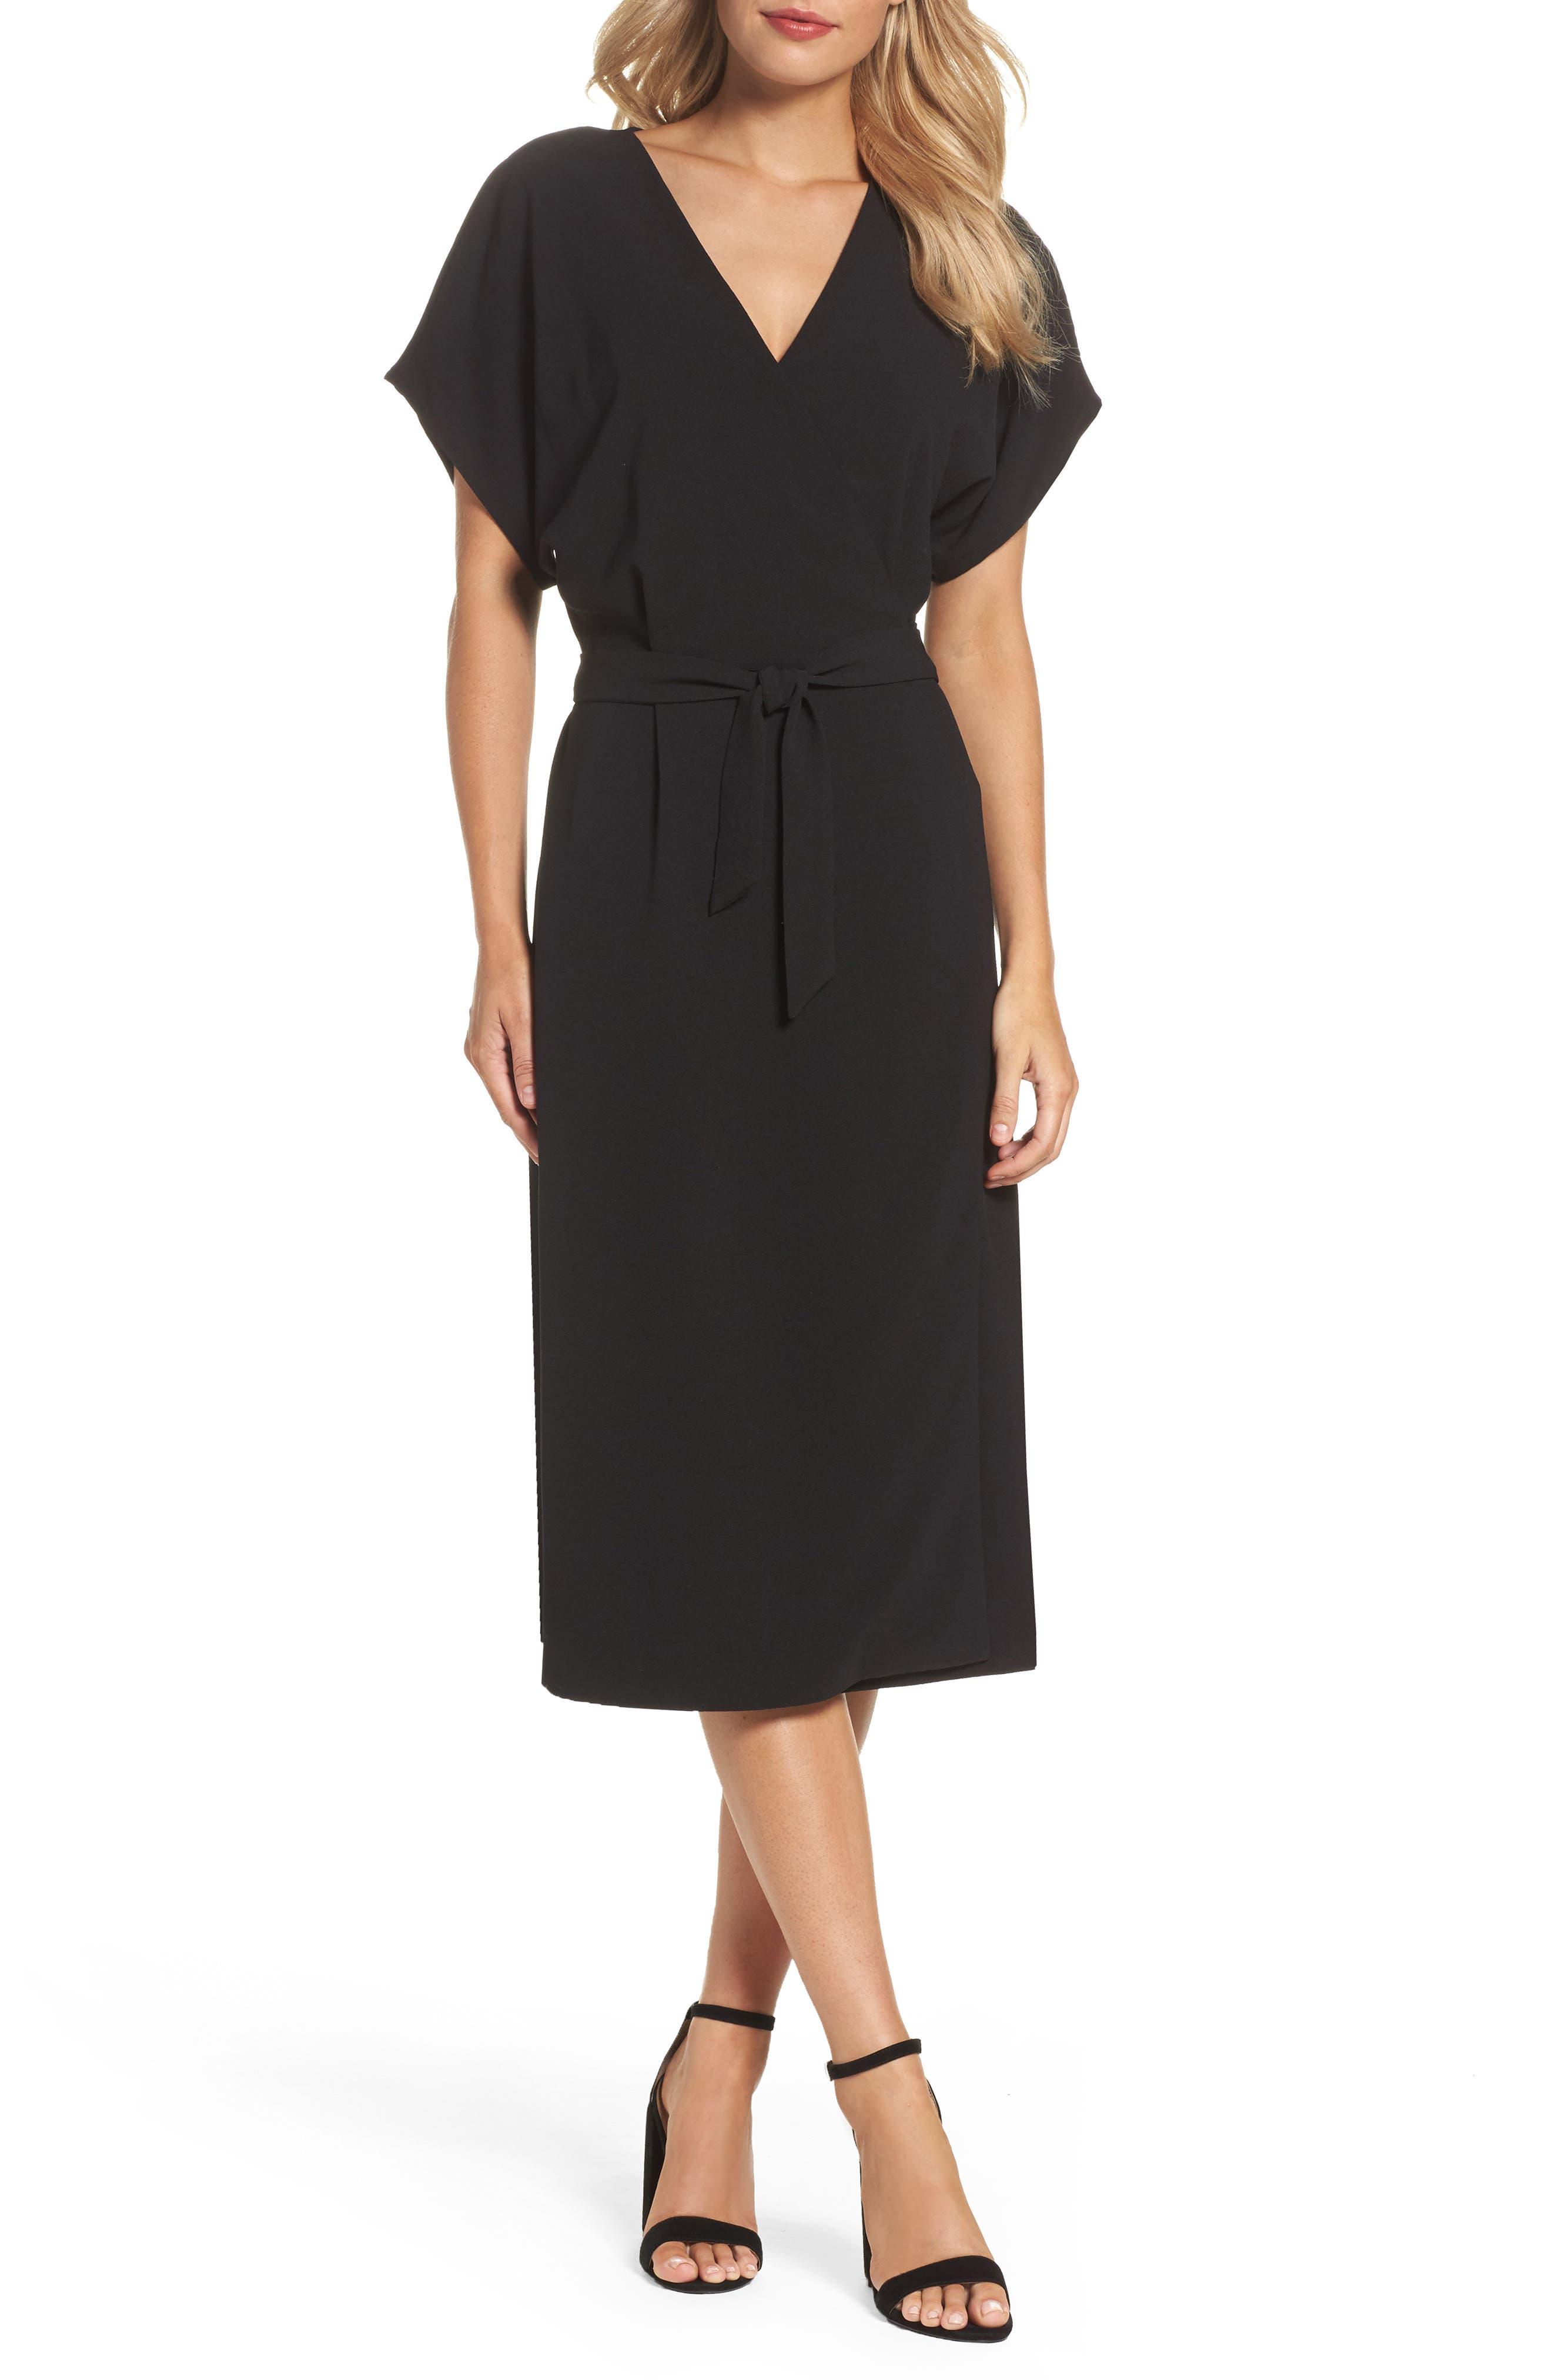 FELICITY & COCO, Rita Wrap Dress, Main thumbnail 1, color, BLACK